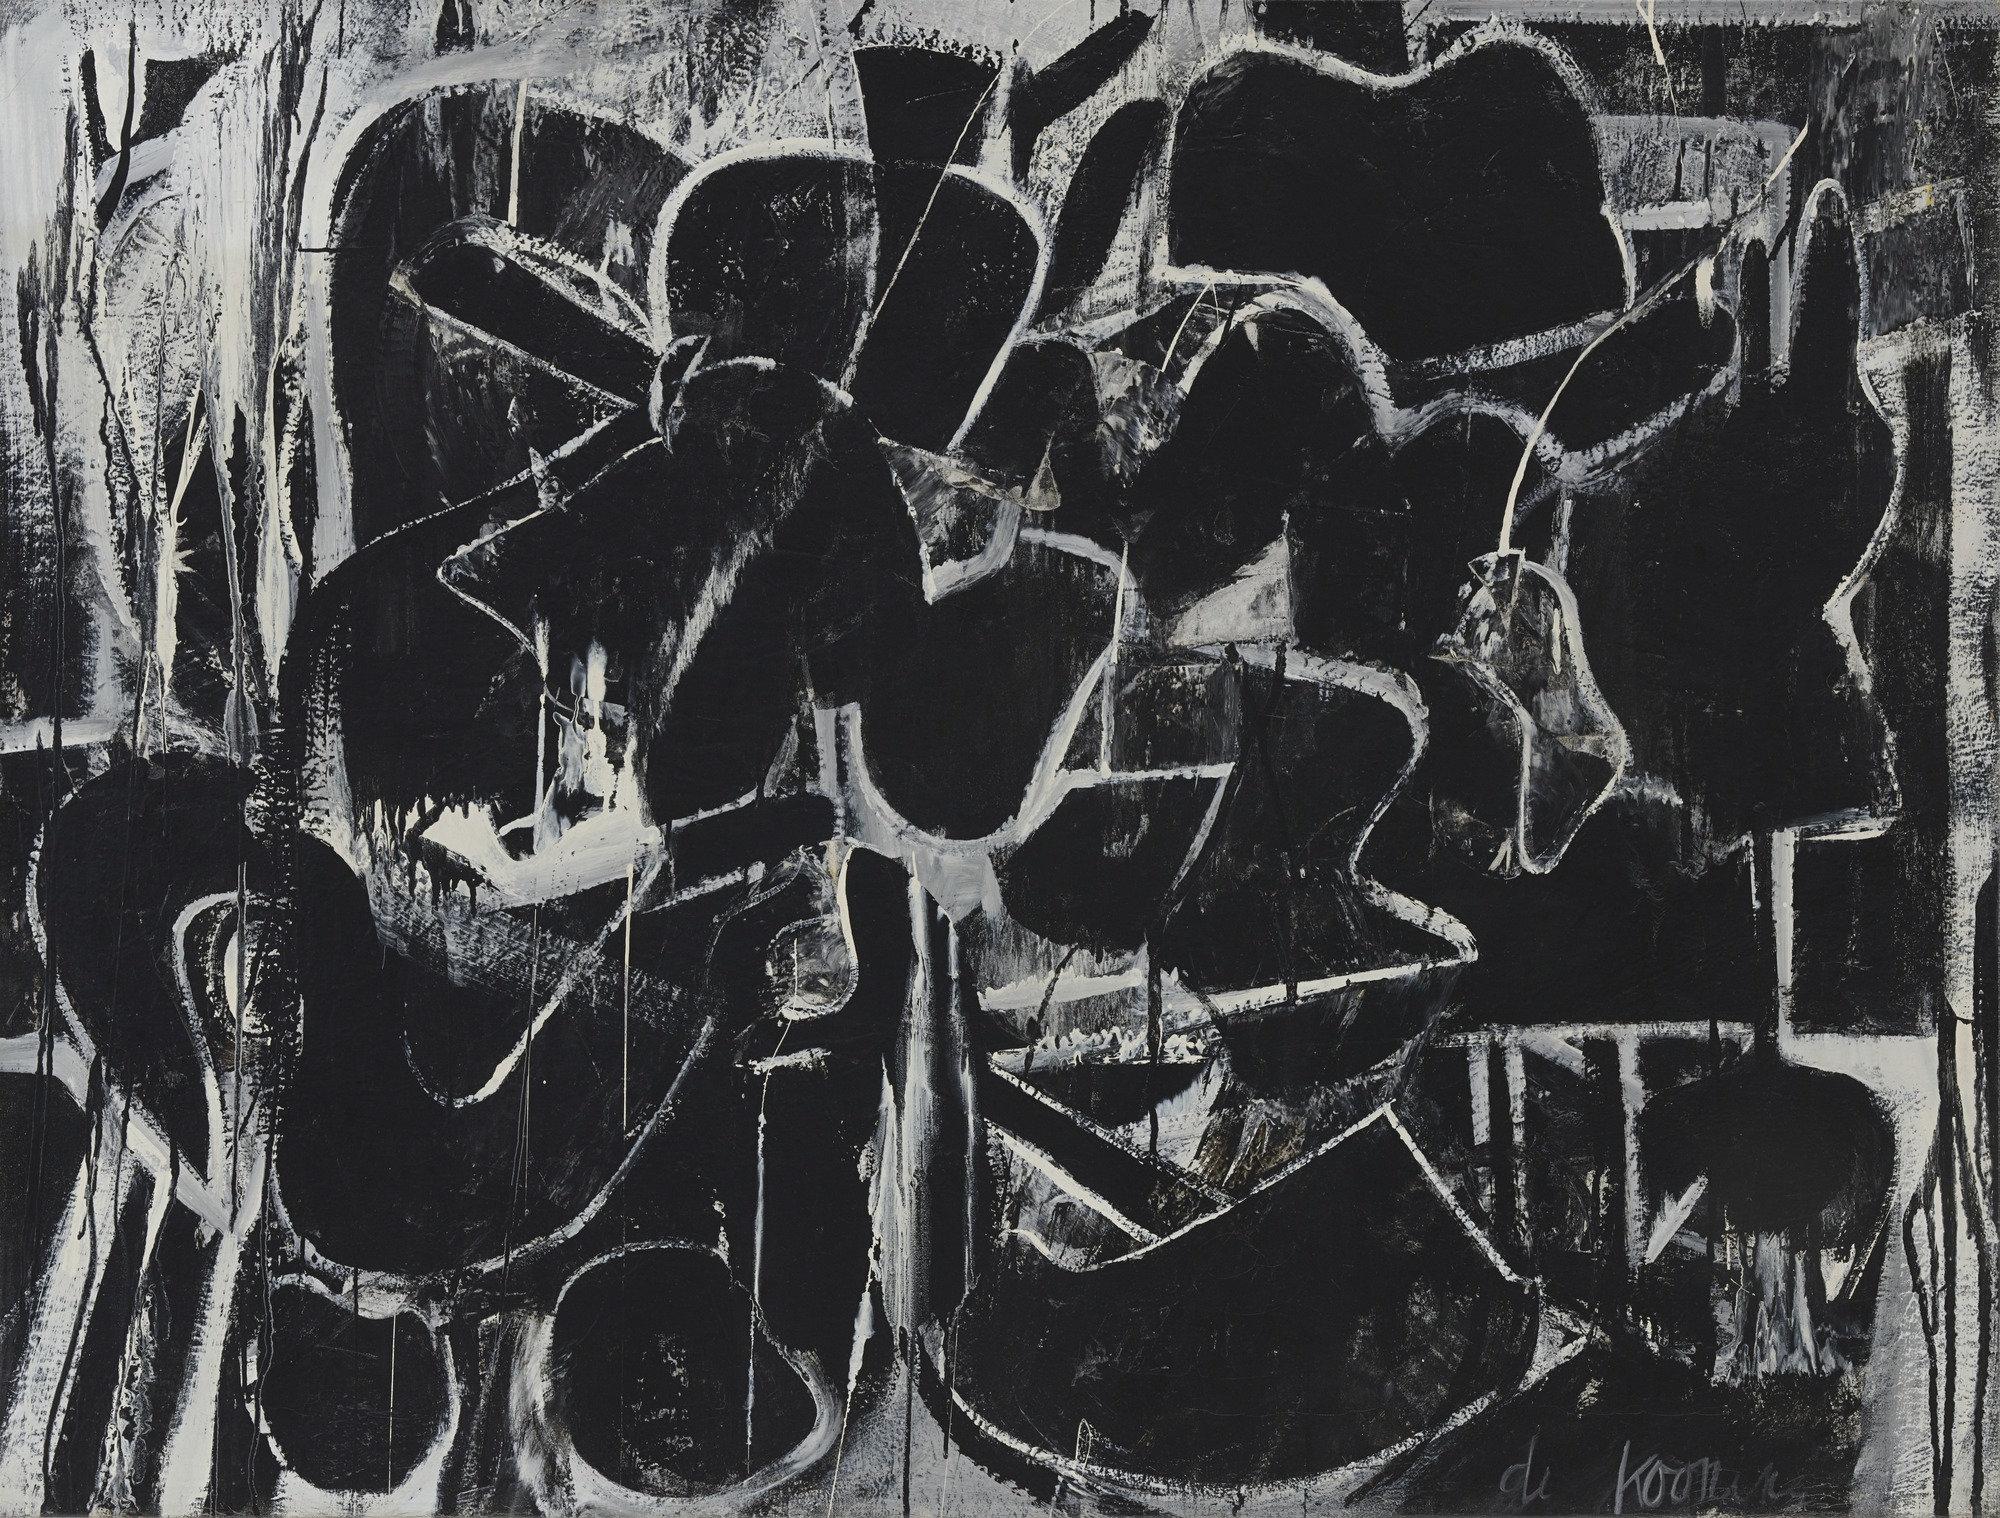 Willem de Kooning,  Painting , 1948, Museum of Modern Art, New York.